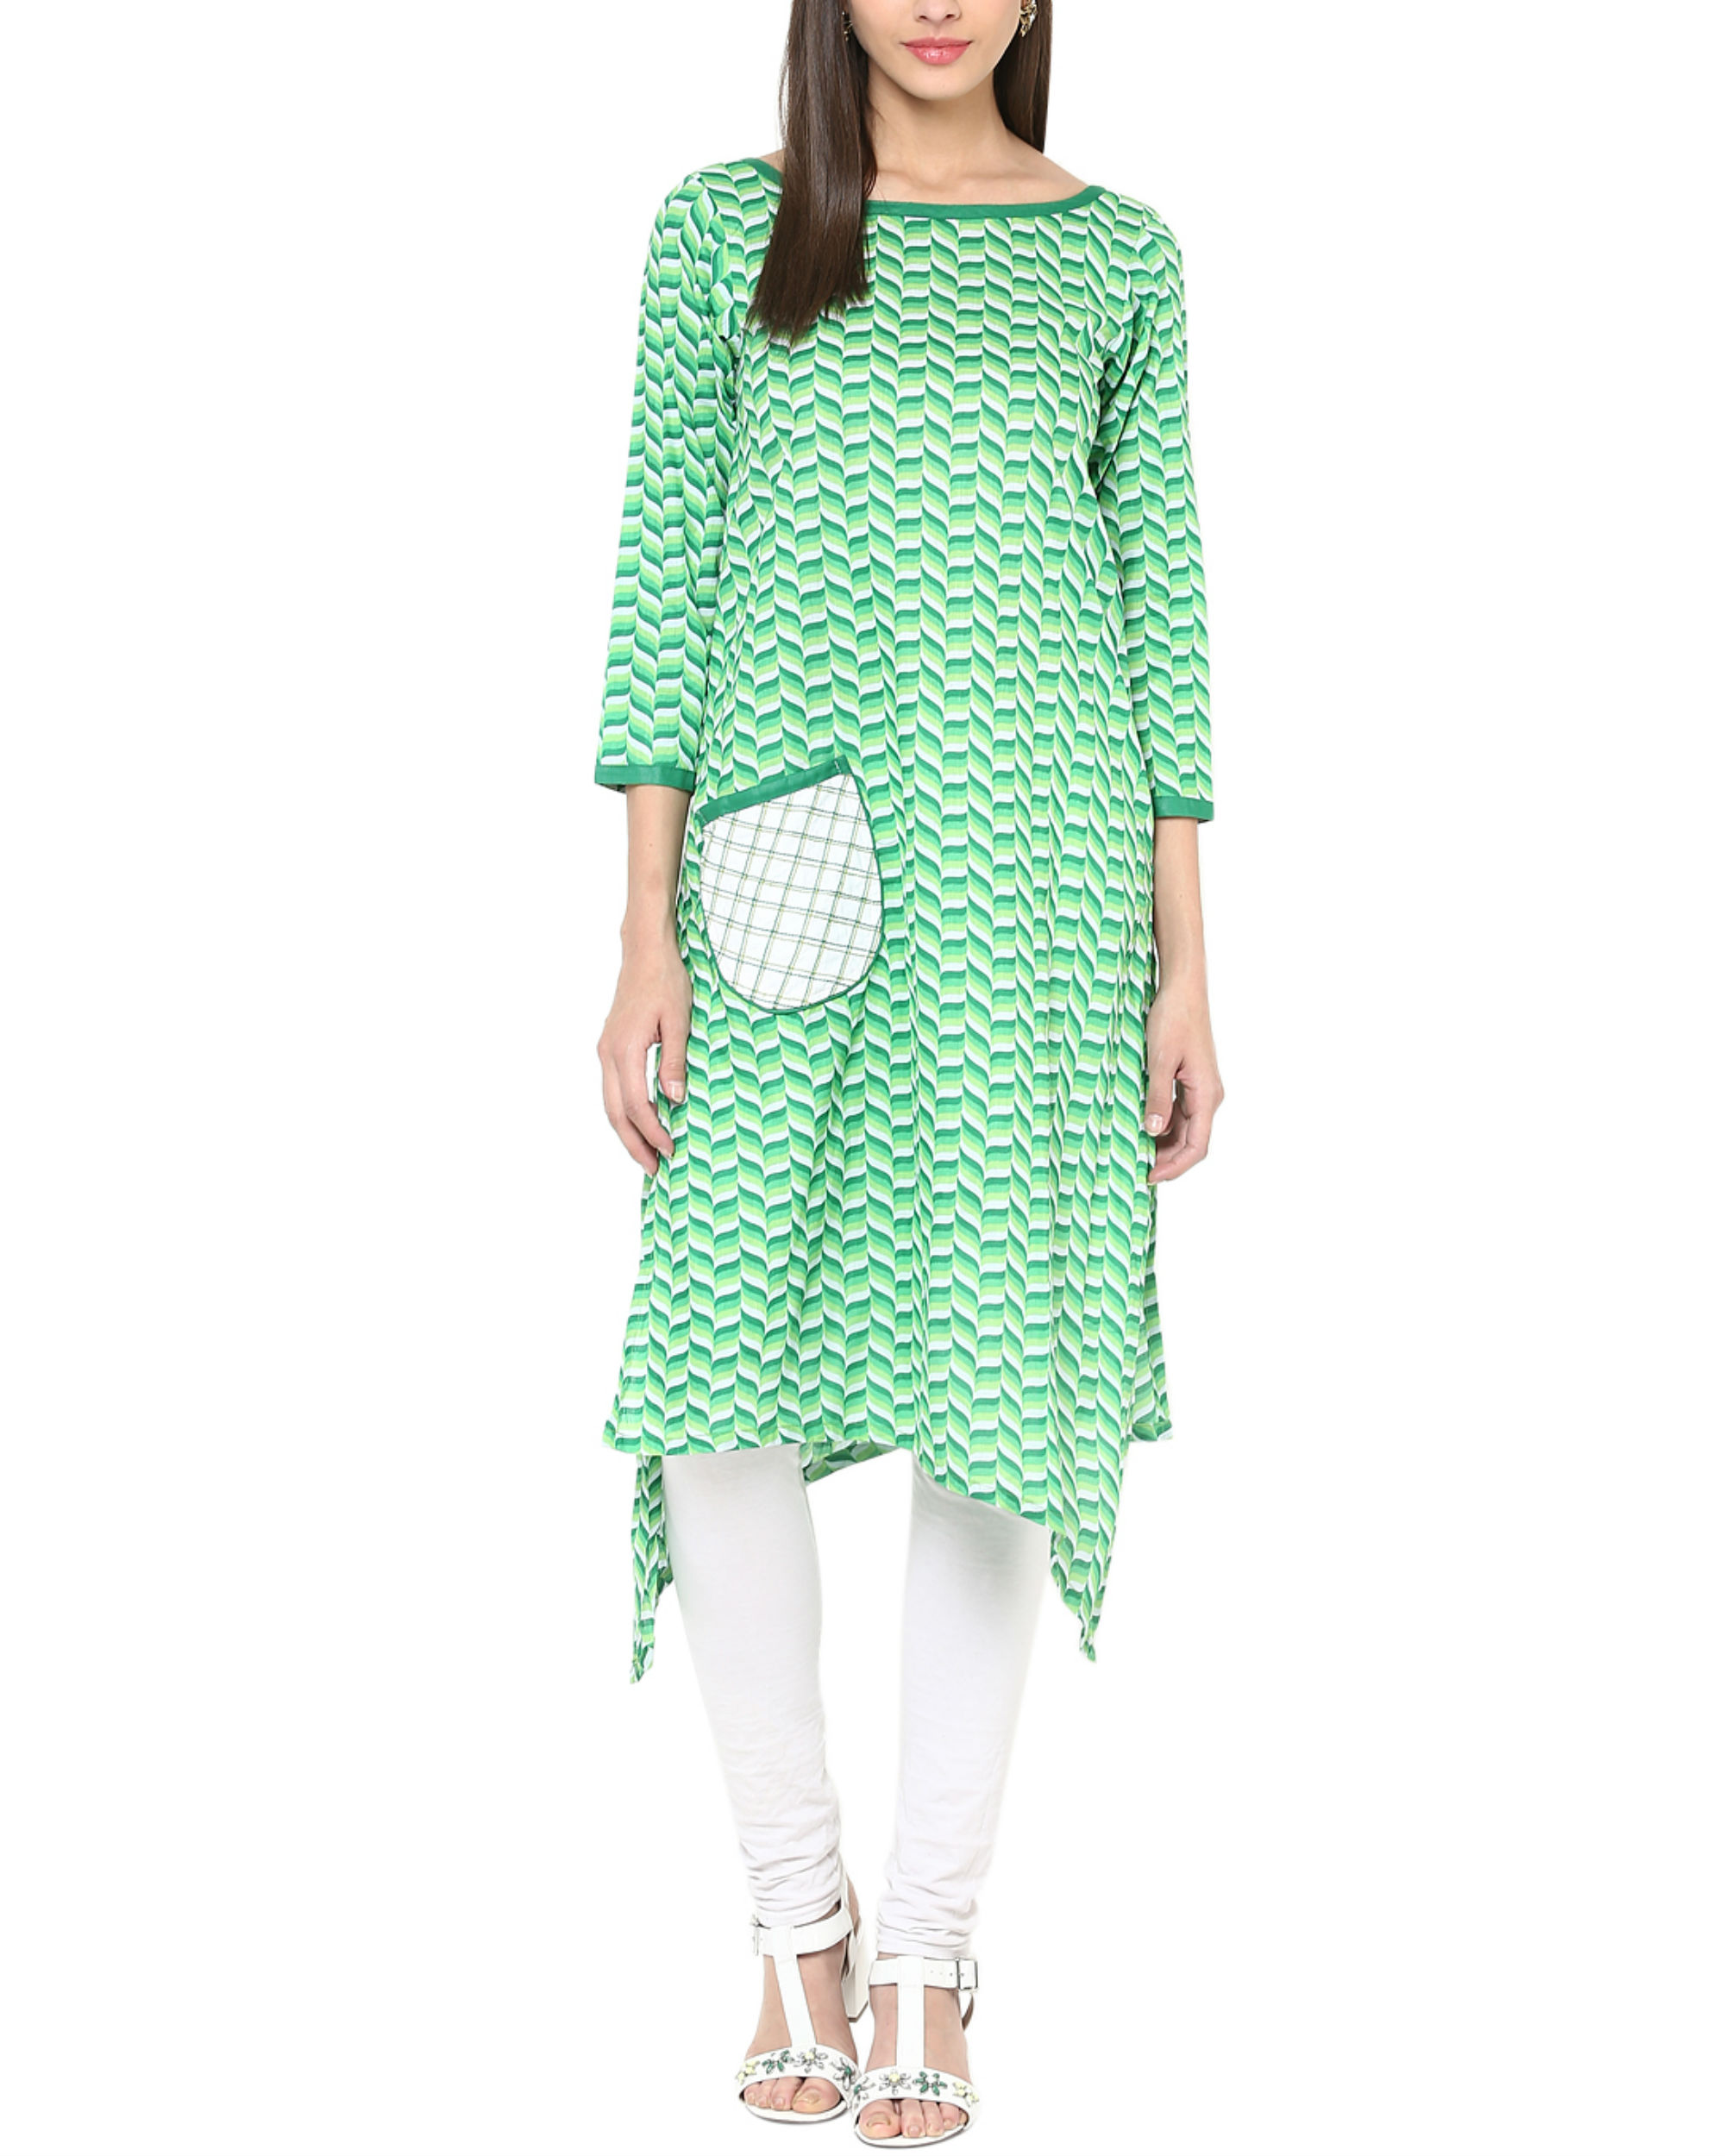 Green tessellated kurta